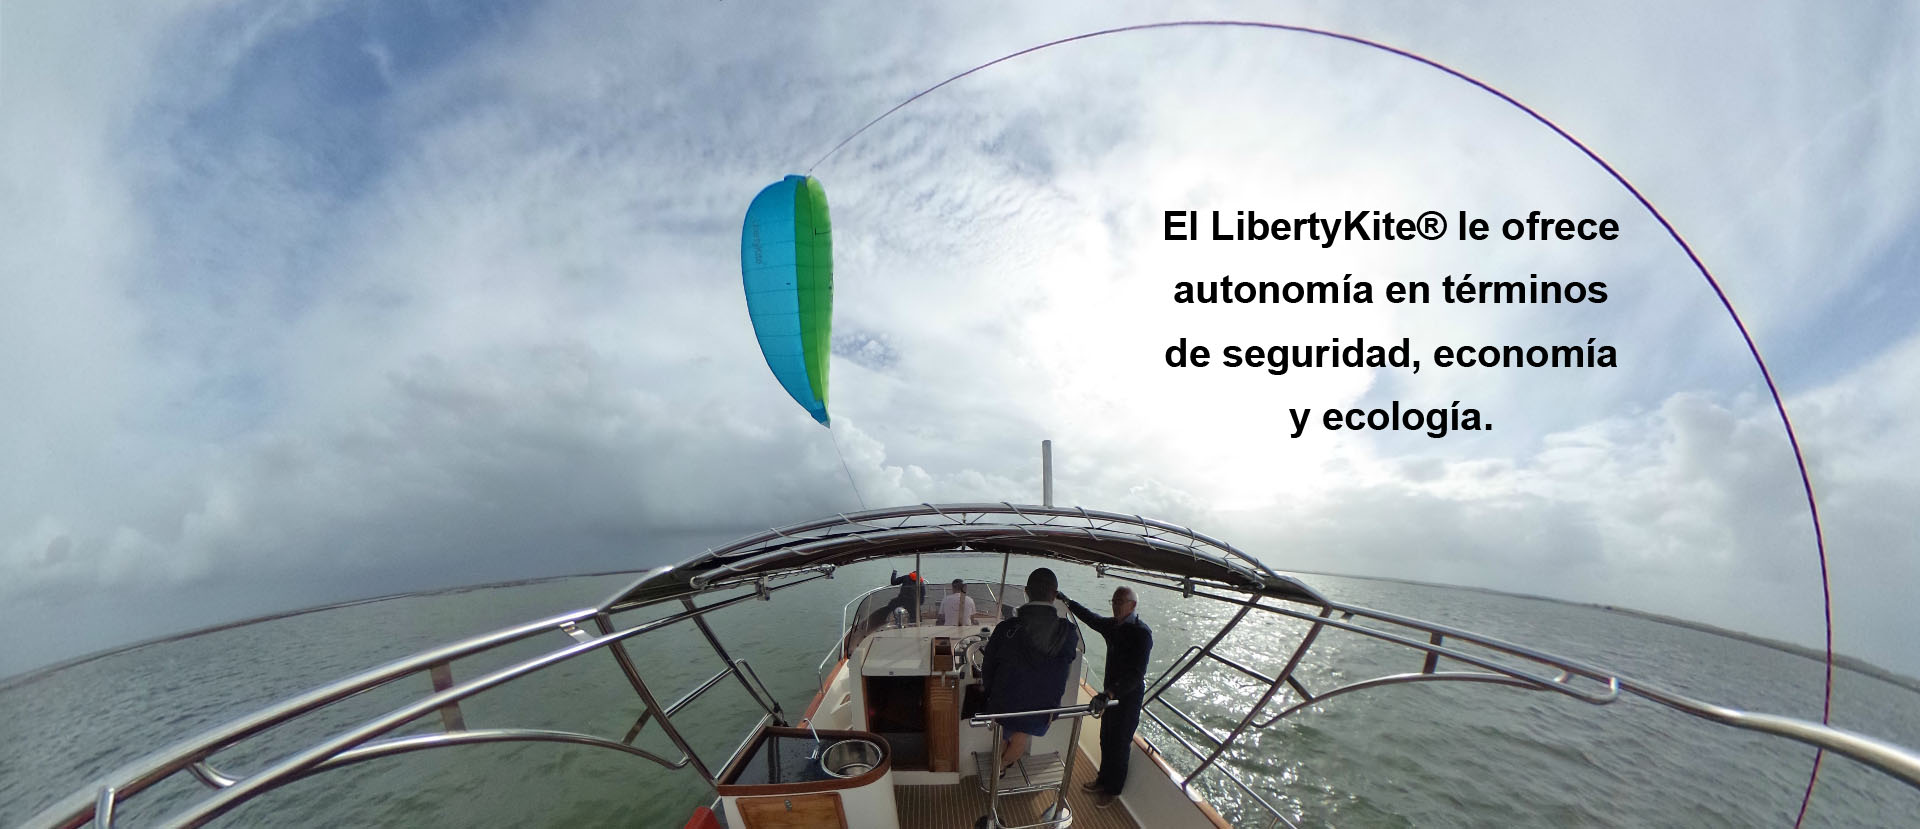 liberty-kite-bateau-22-es